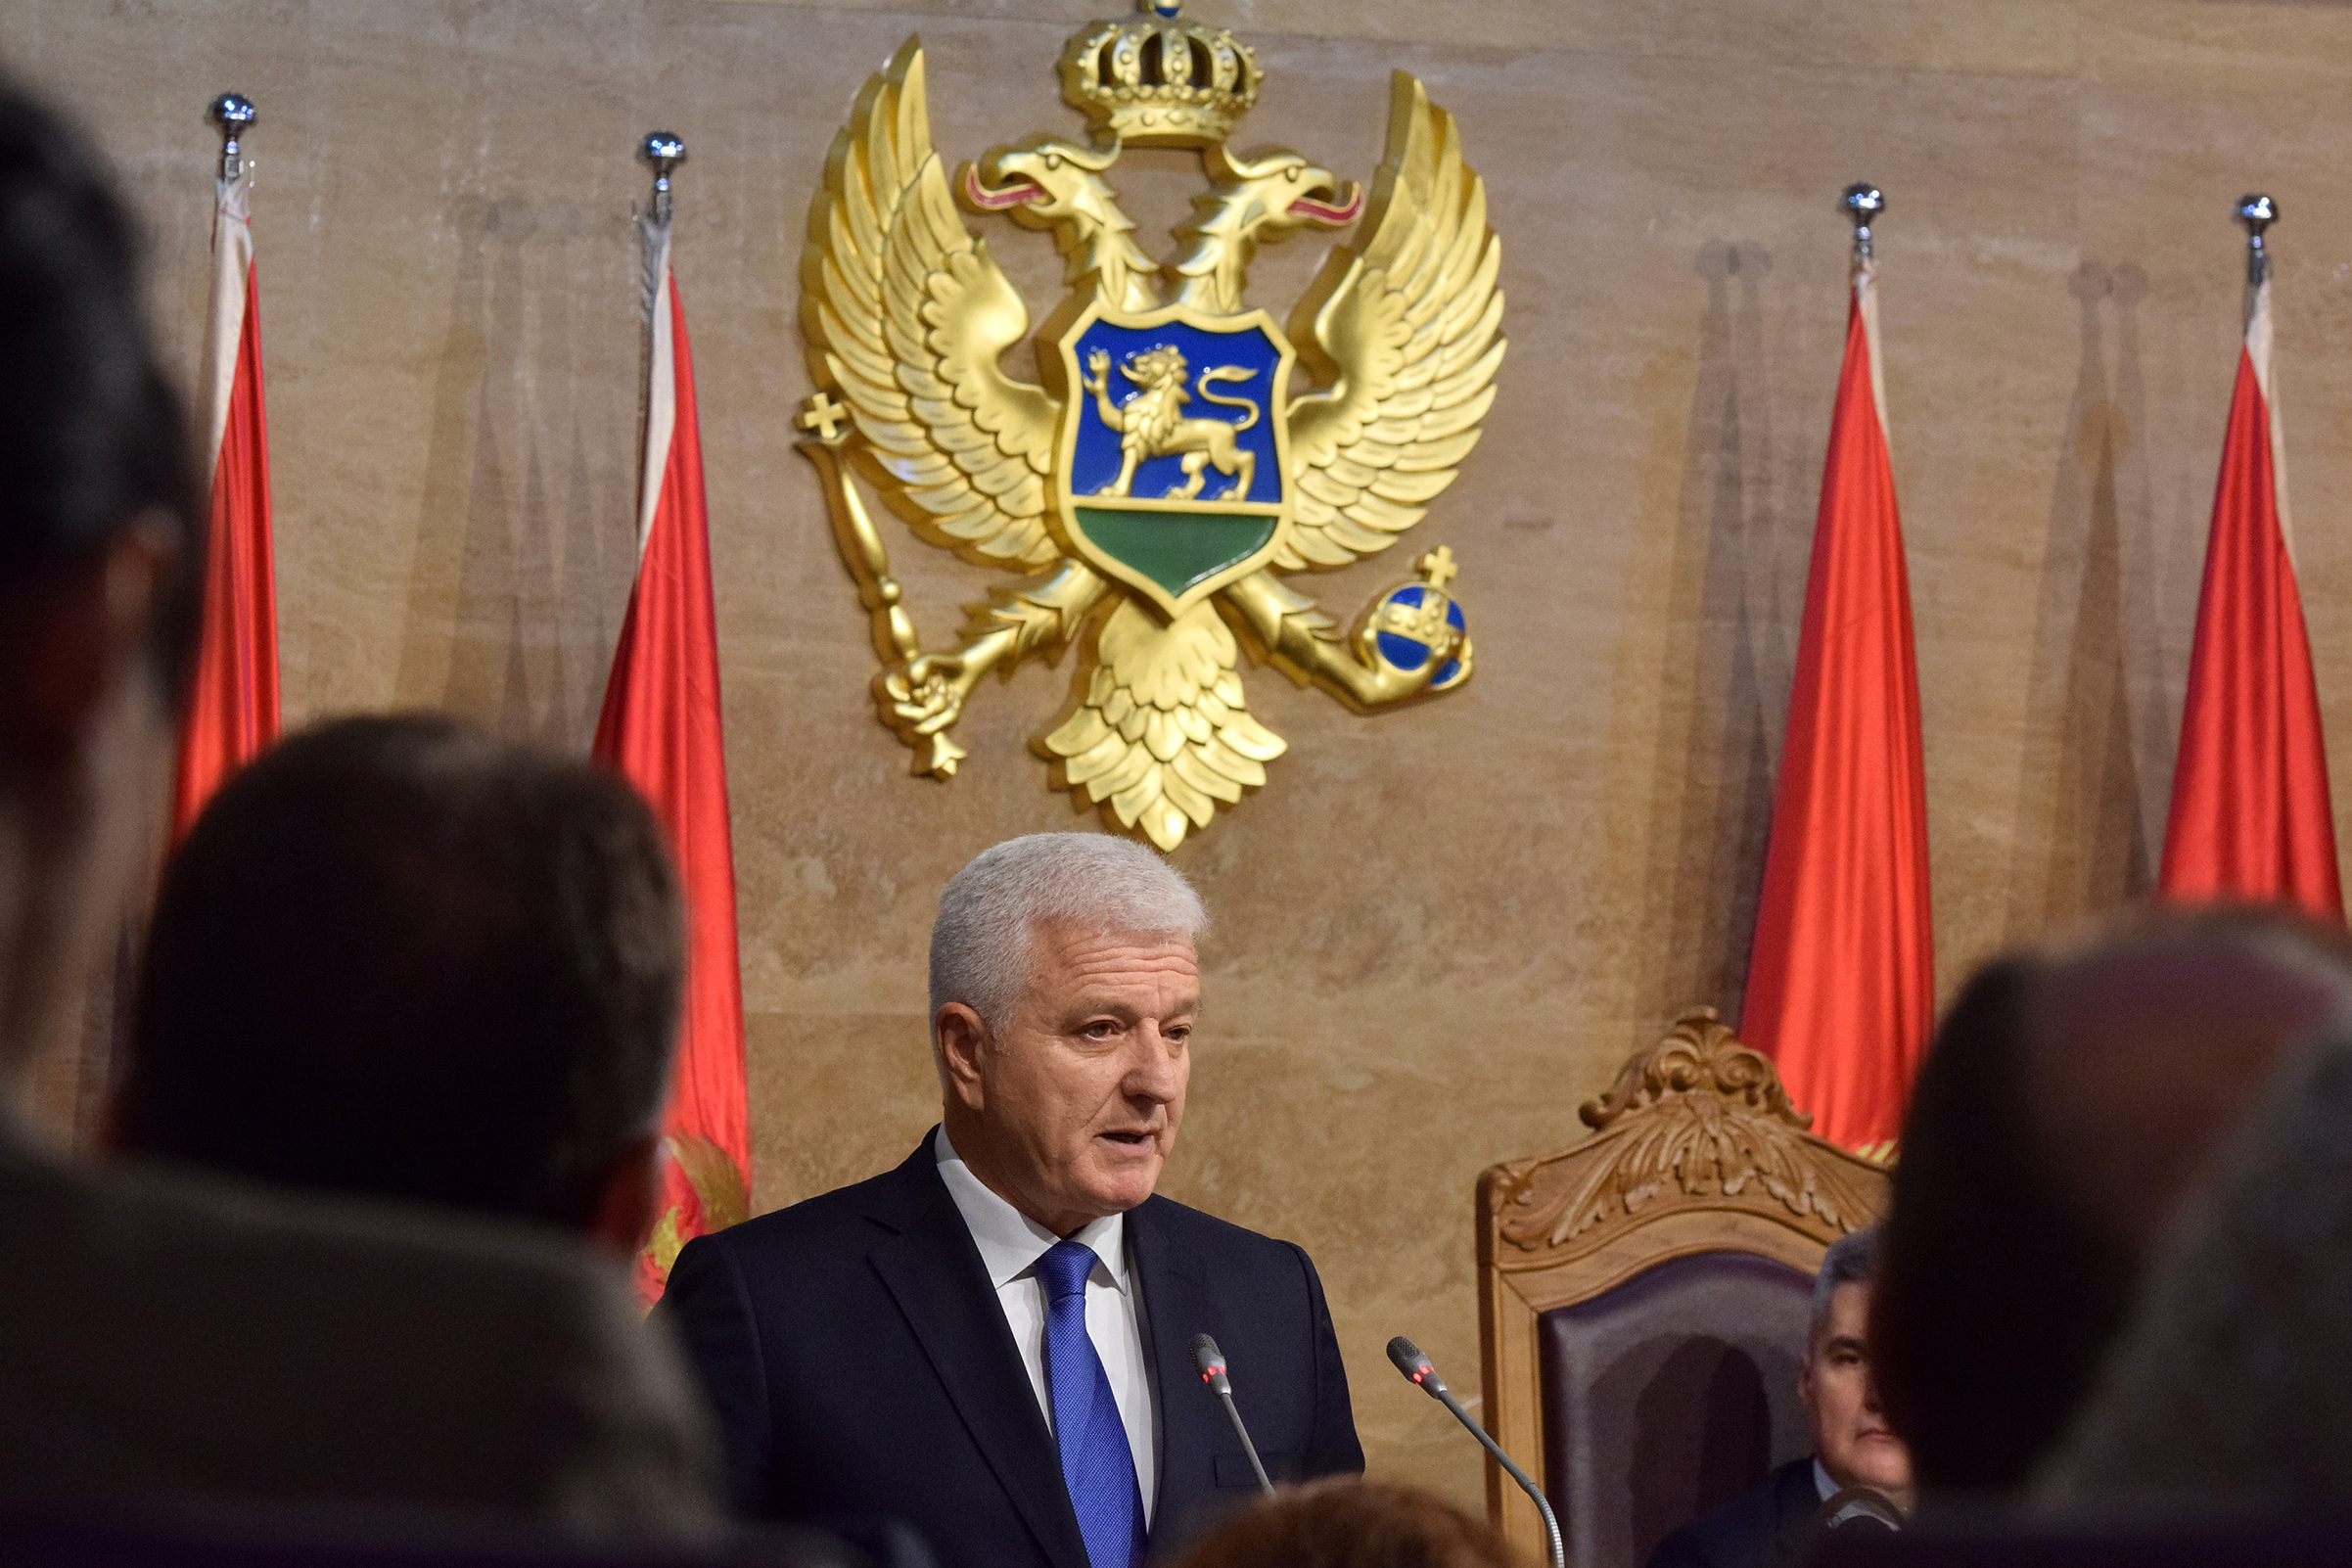 Prime Minister Dusko Markovic addresses the parliament in Podgorica, Montenegro, on Nov. 28, November 2016.